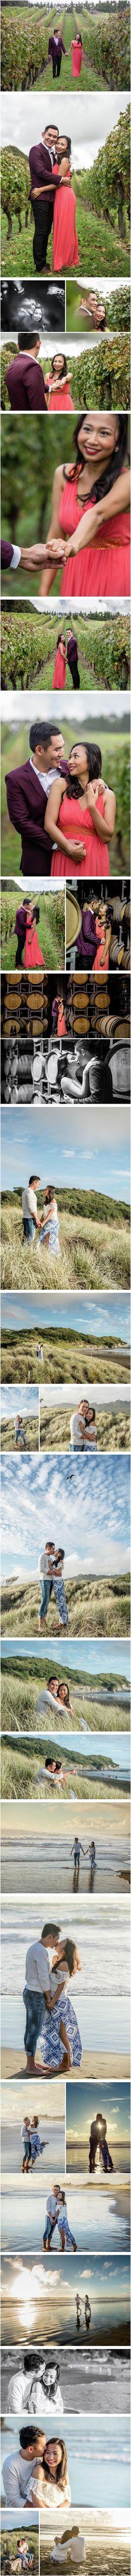 Ivana & Milan Photography   SOLJANS VINEYARD AND MURIWAI BEACH ENGAGEMENT PHOTOS: ANN & CHUCK